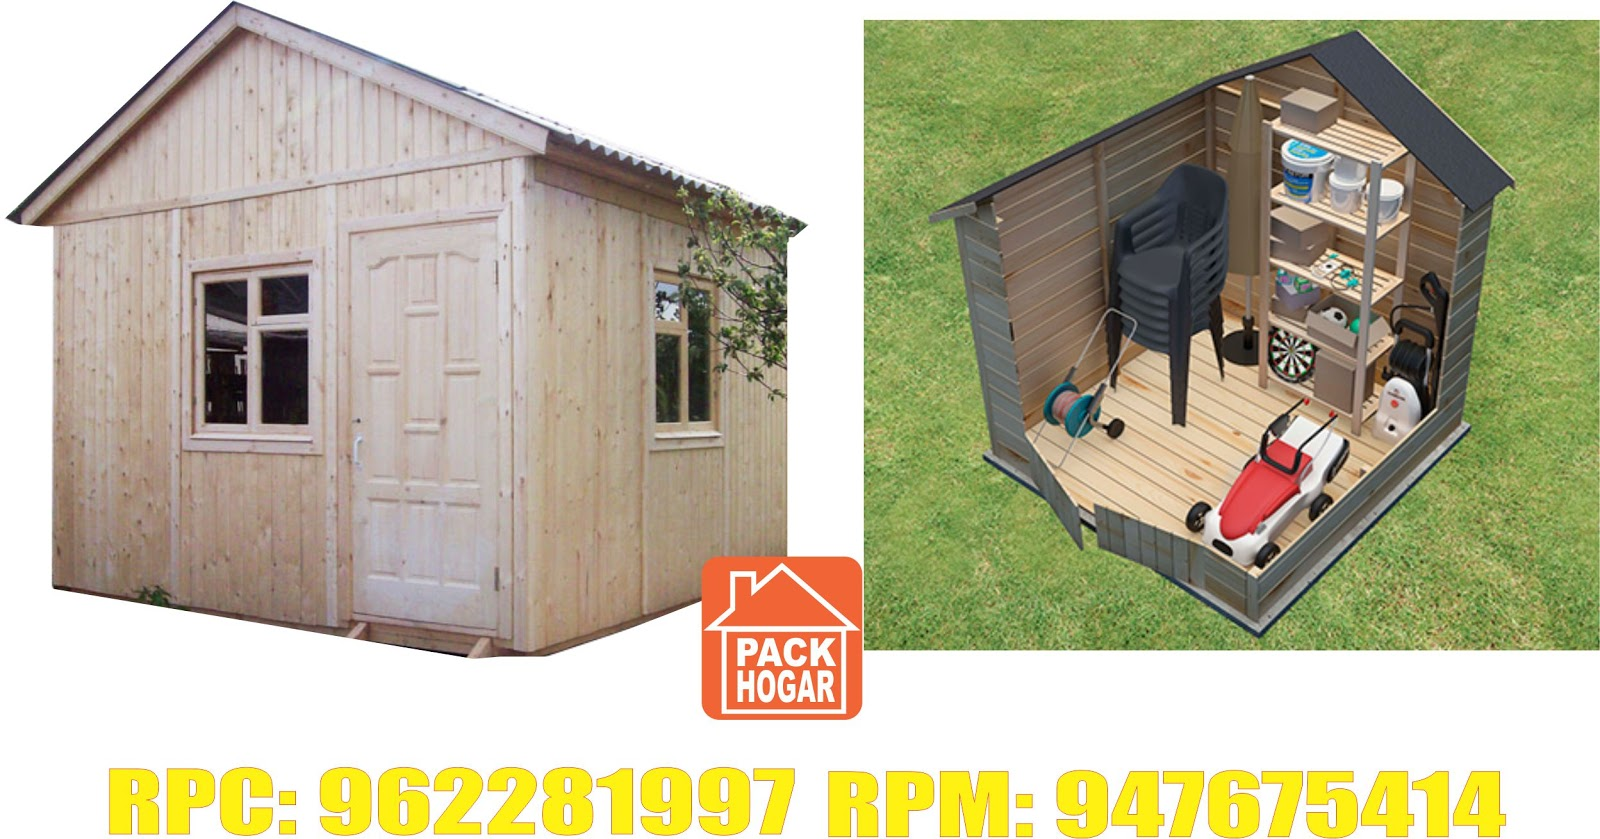 Casas de campo playa de madera prefabricadas - Refugios de madera prefabricados ...